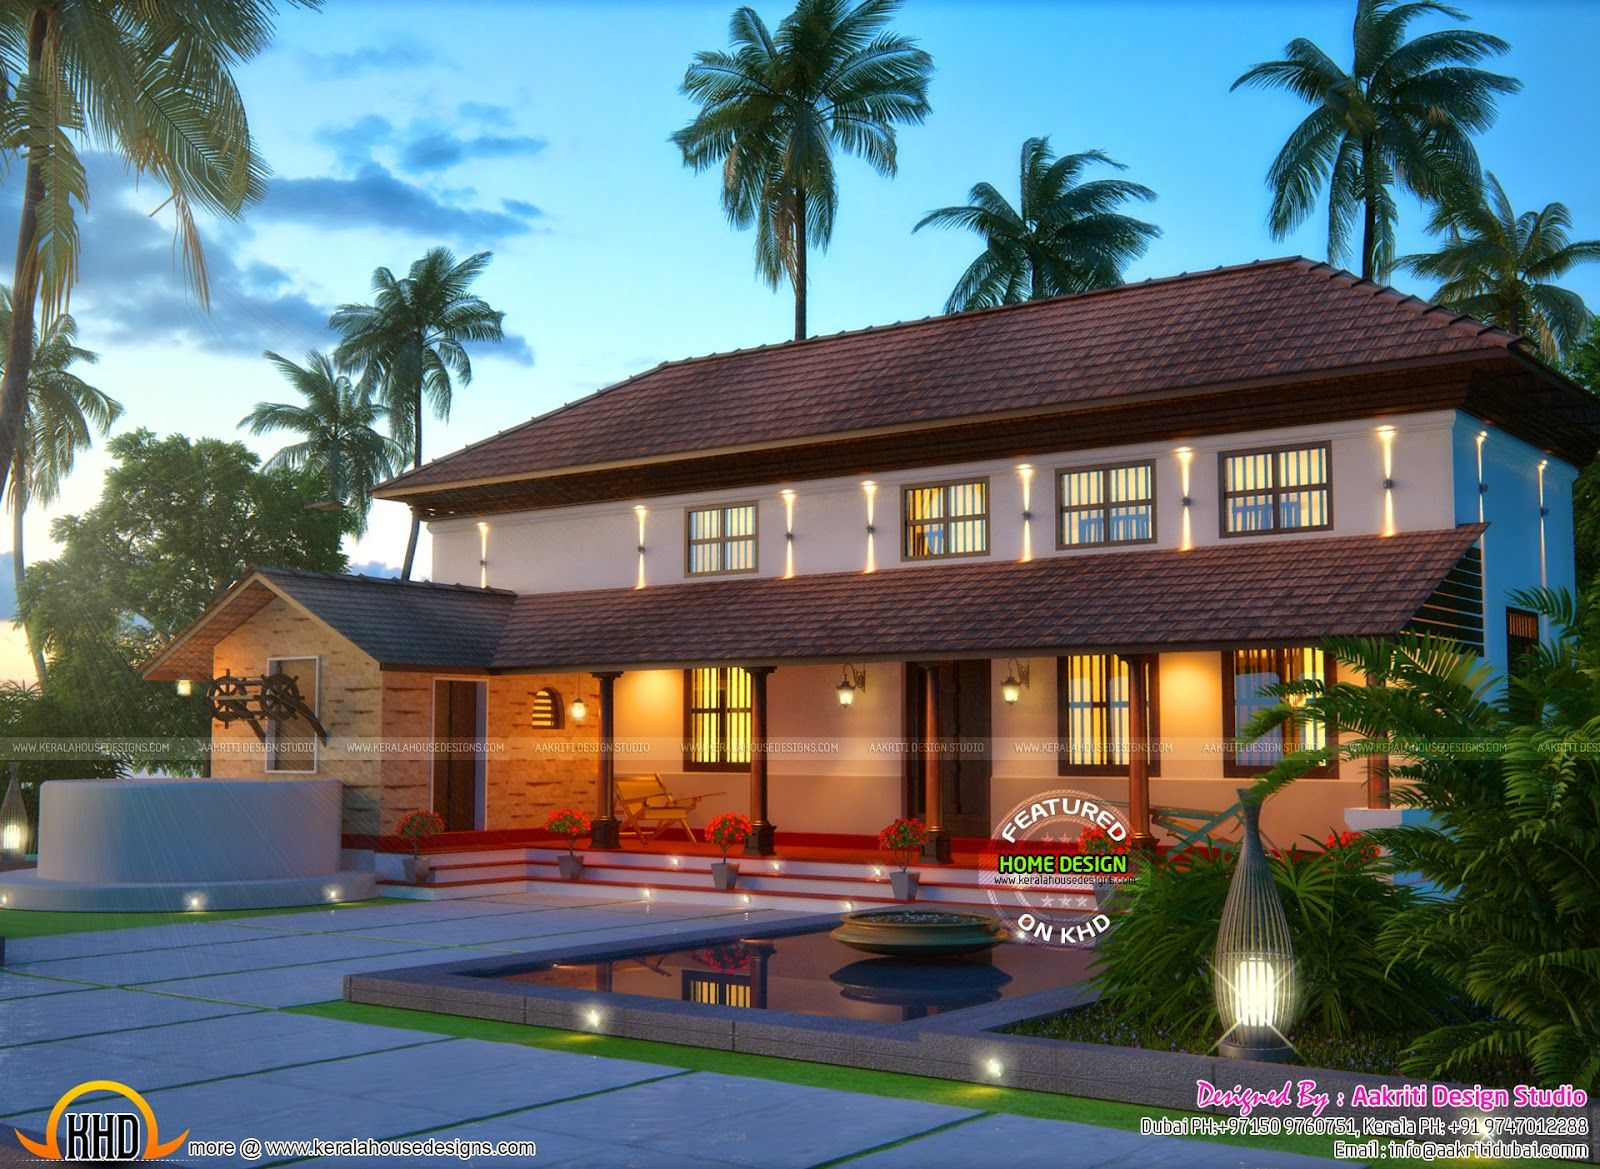 Pure Kerala Traditional Farmhouse Craftsman style house